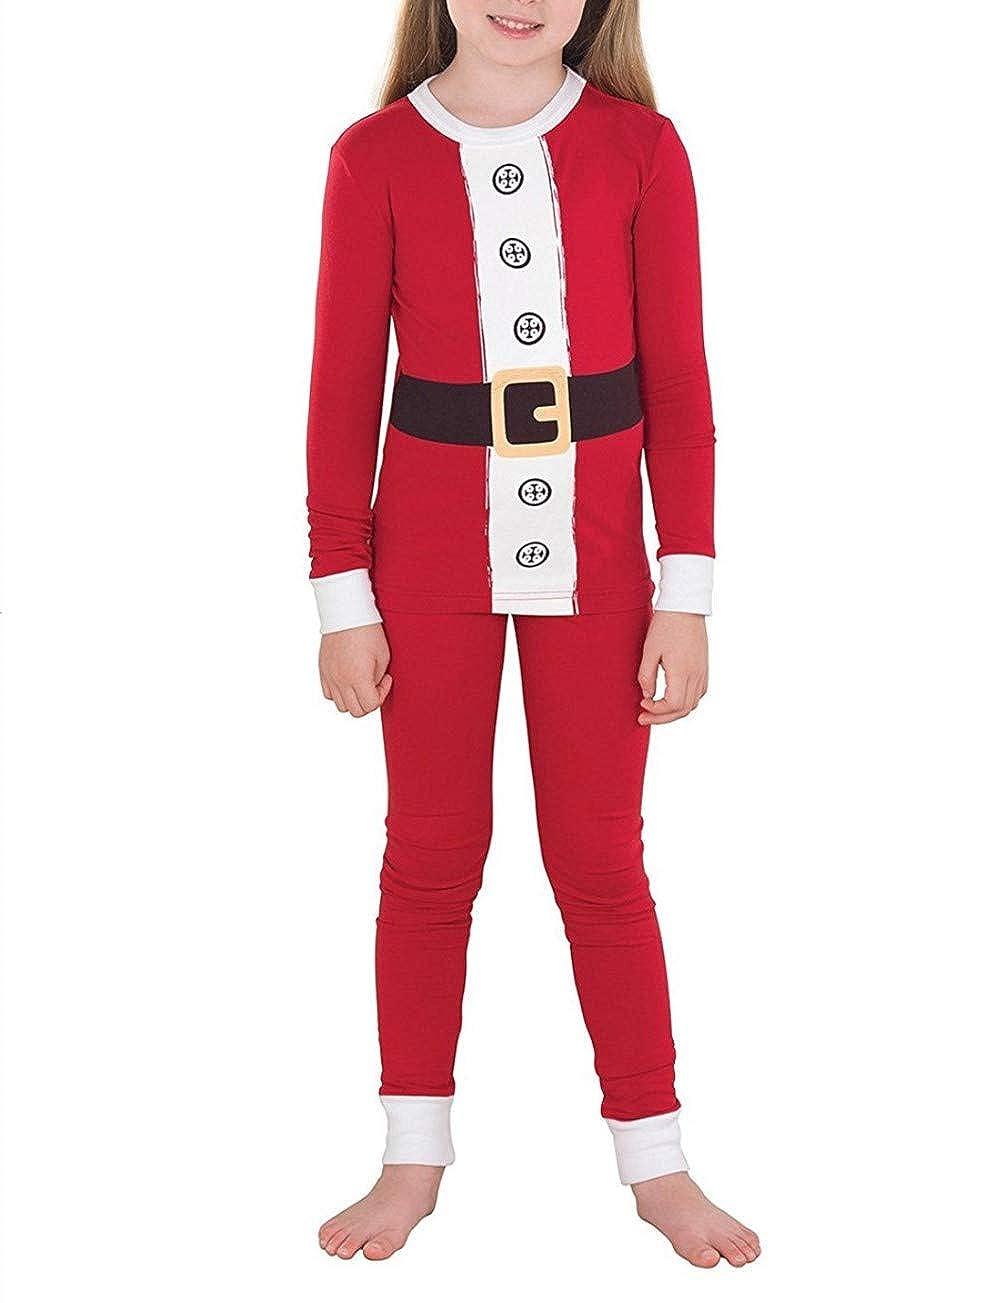 Q/&Y Matching Christmas Pajamas for Family Sleepwear Nightwear Red Pajamas Set